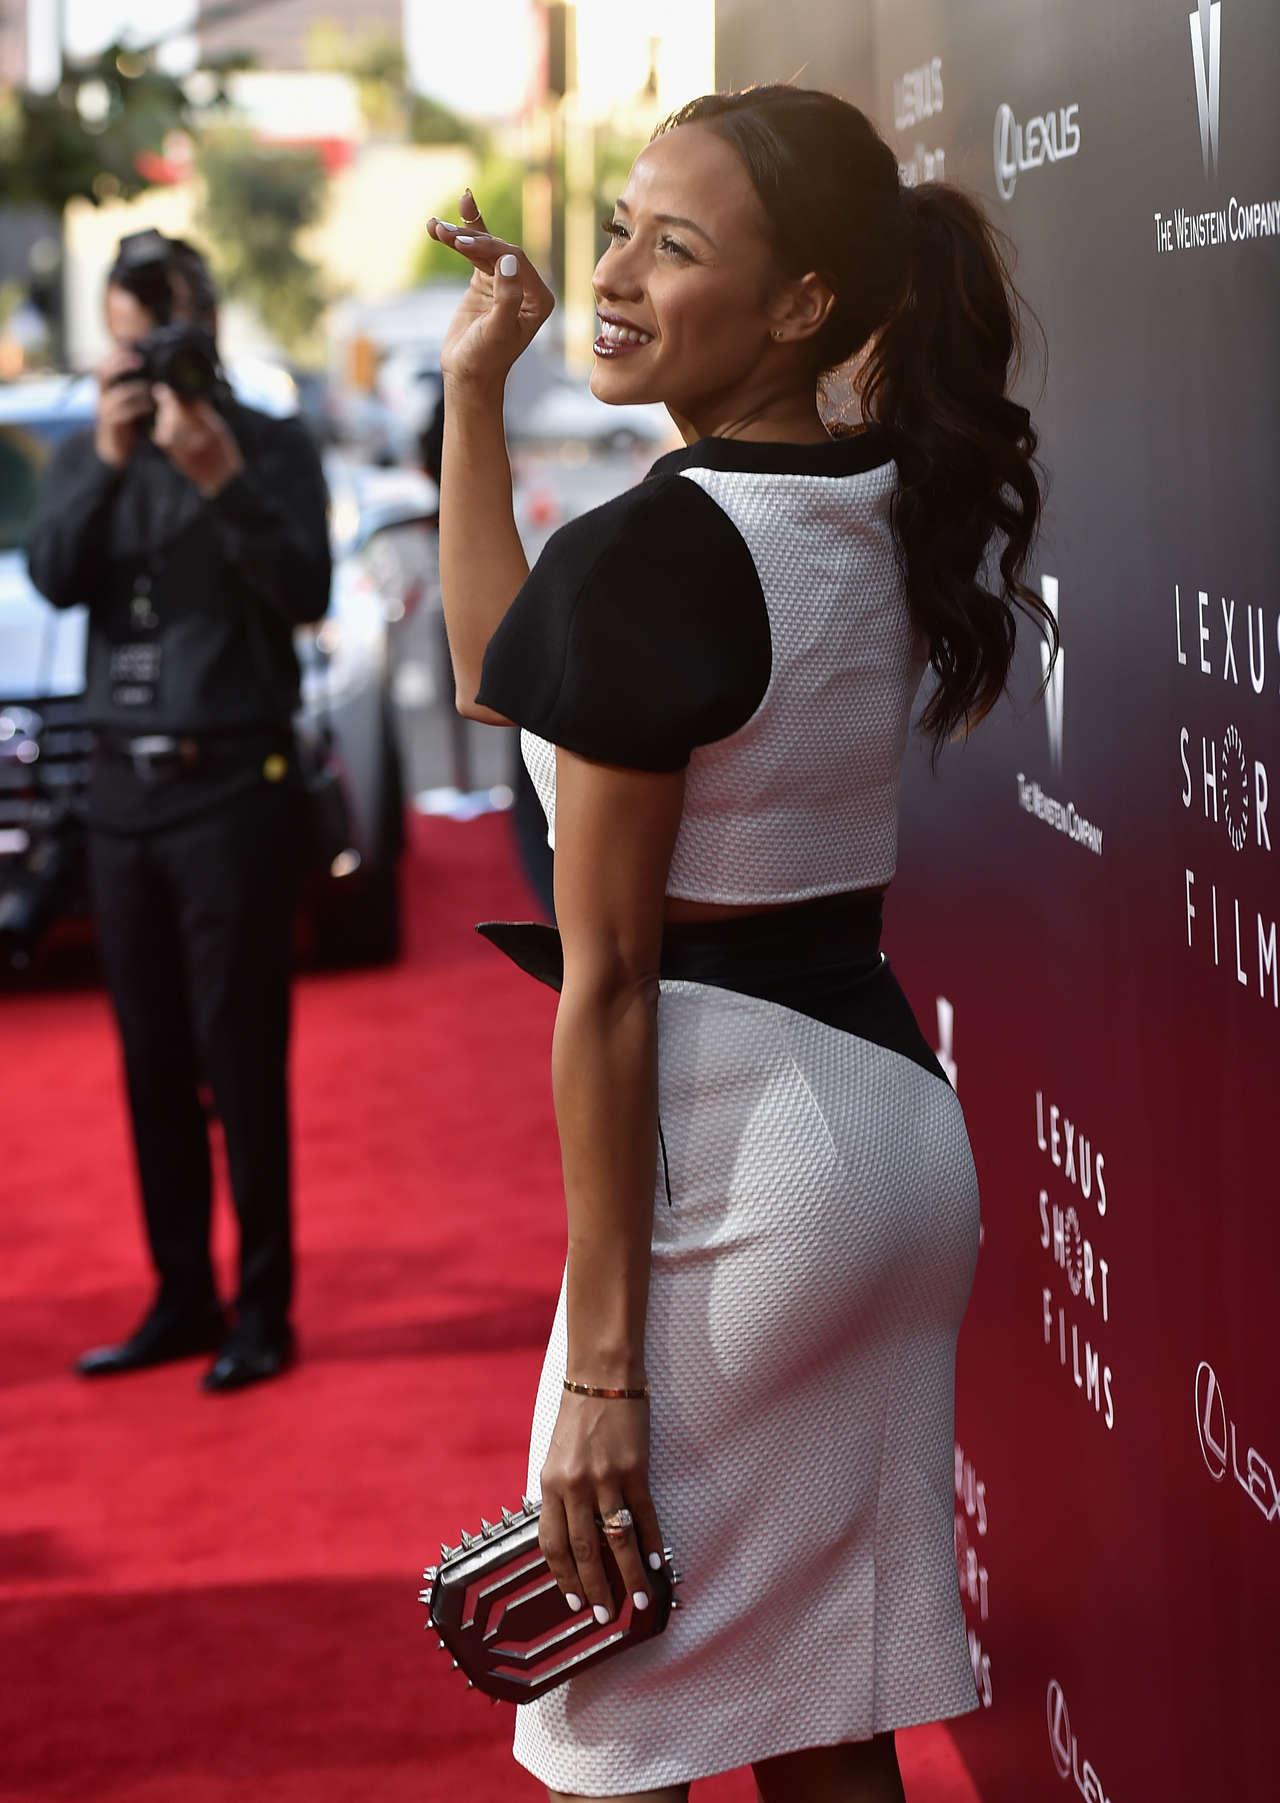 Dania Ramirez In B&W at 2014 Lexus Short Films premiere in Los Angeles